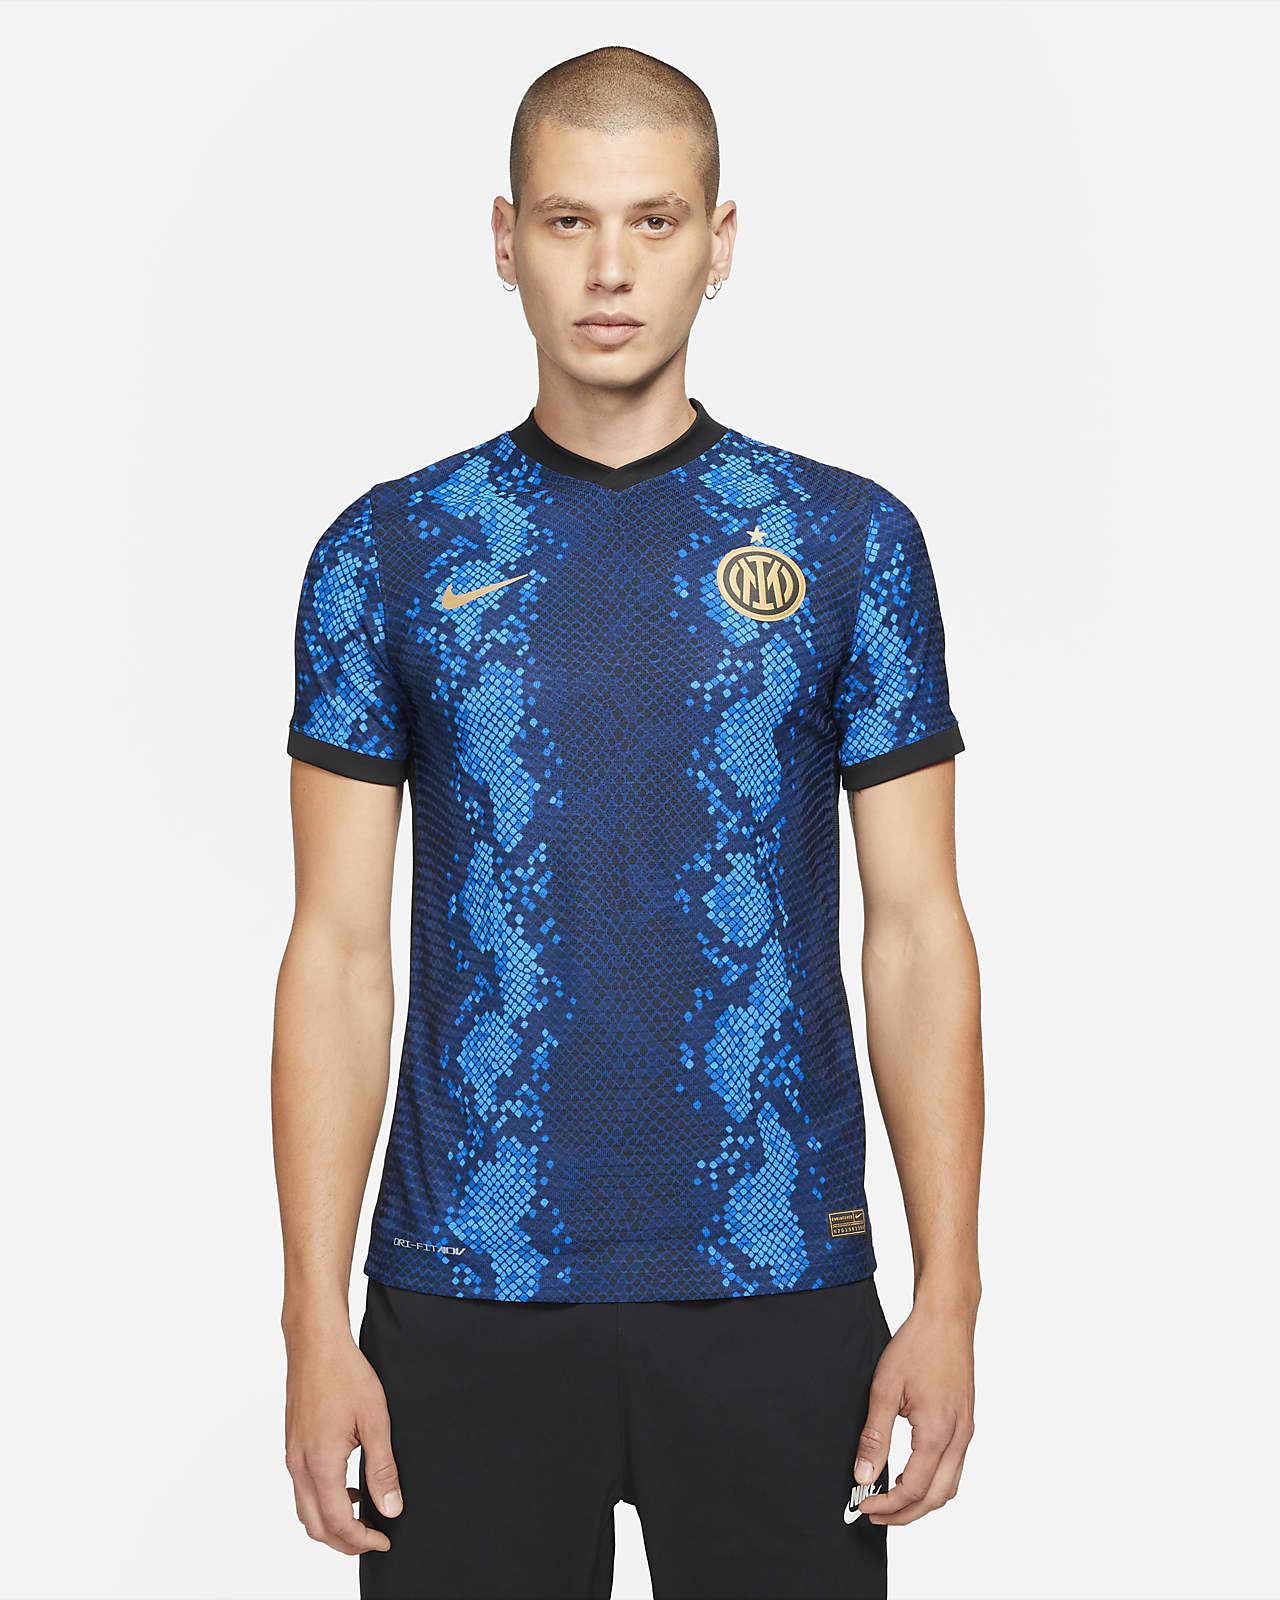 Inter Milan 2021/22 Match Home Men's Nike Dri-FIT ADV Soccer Jersey